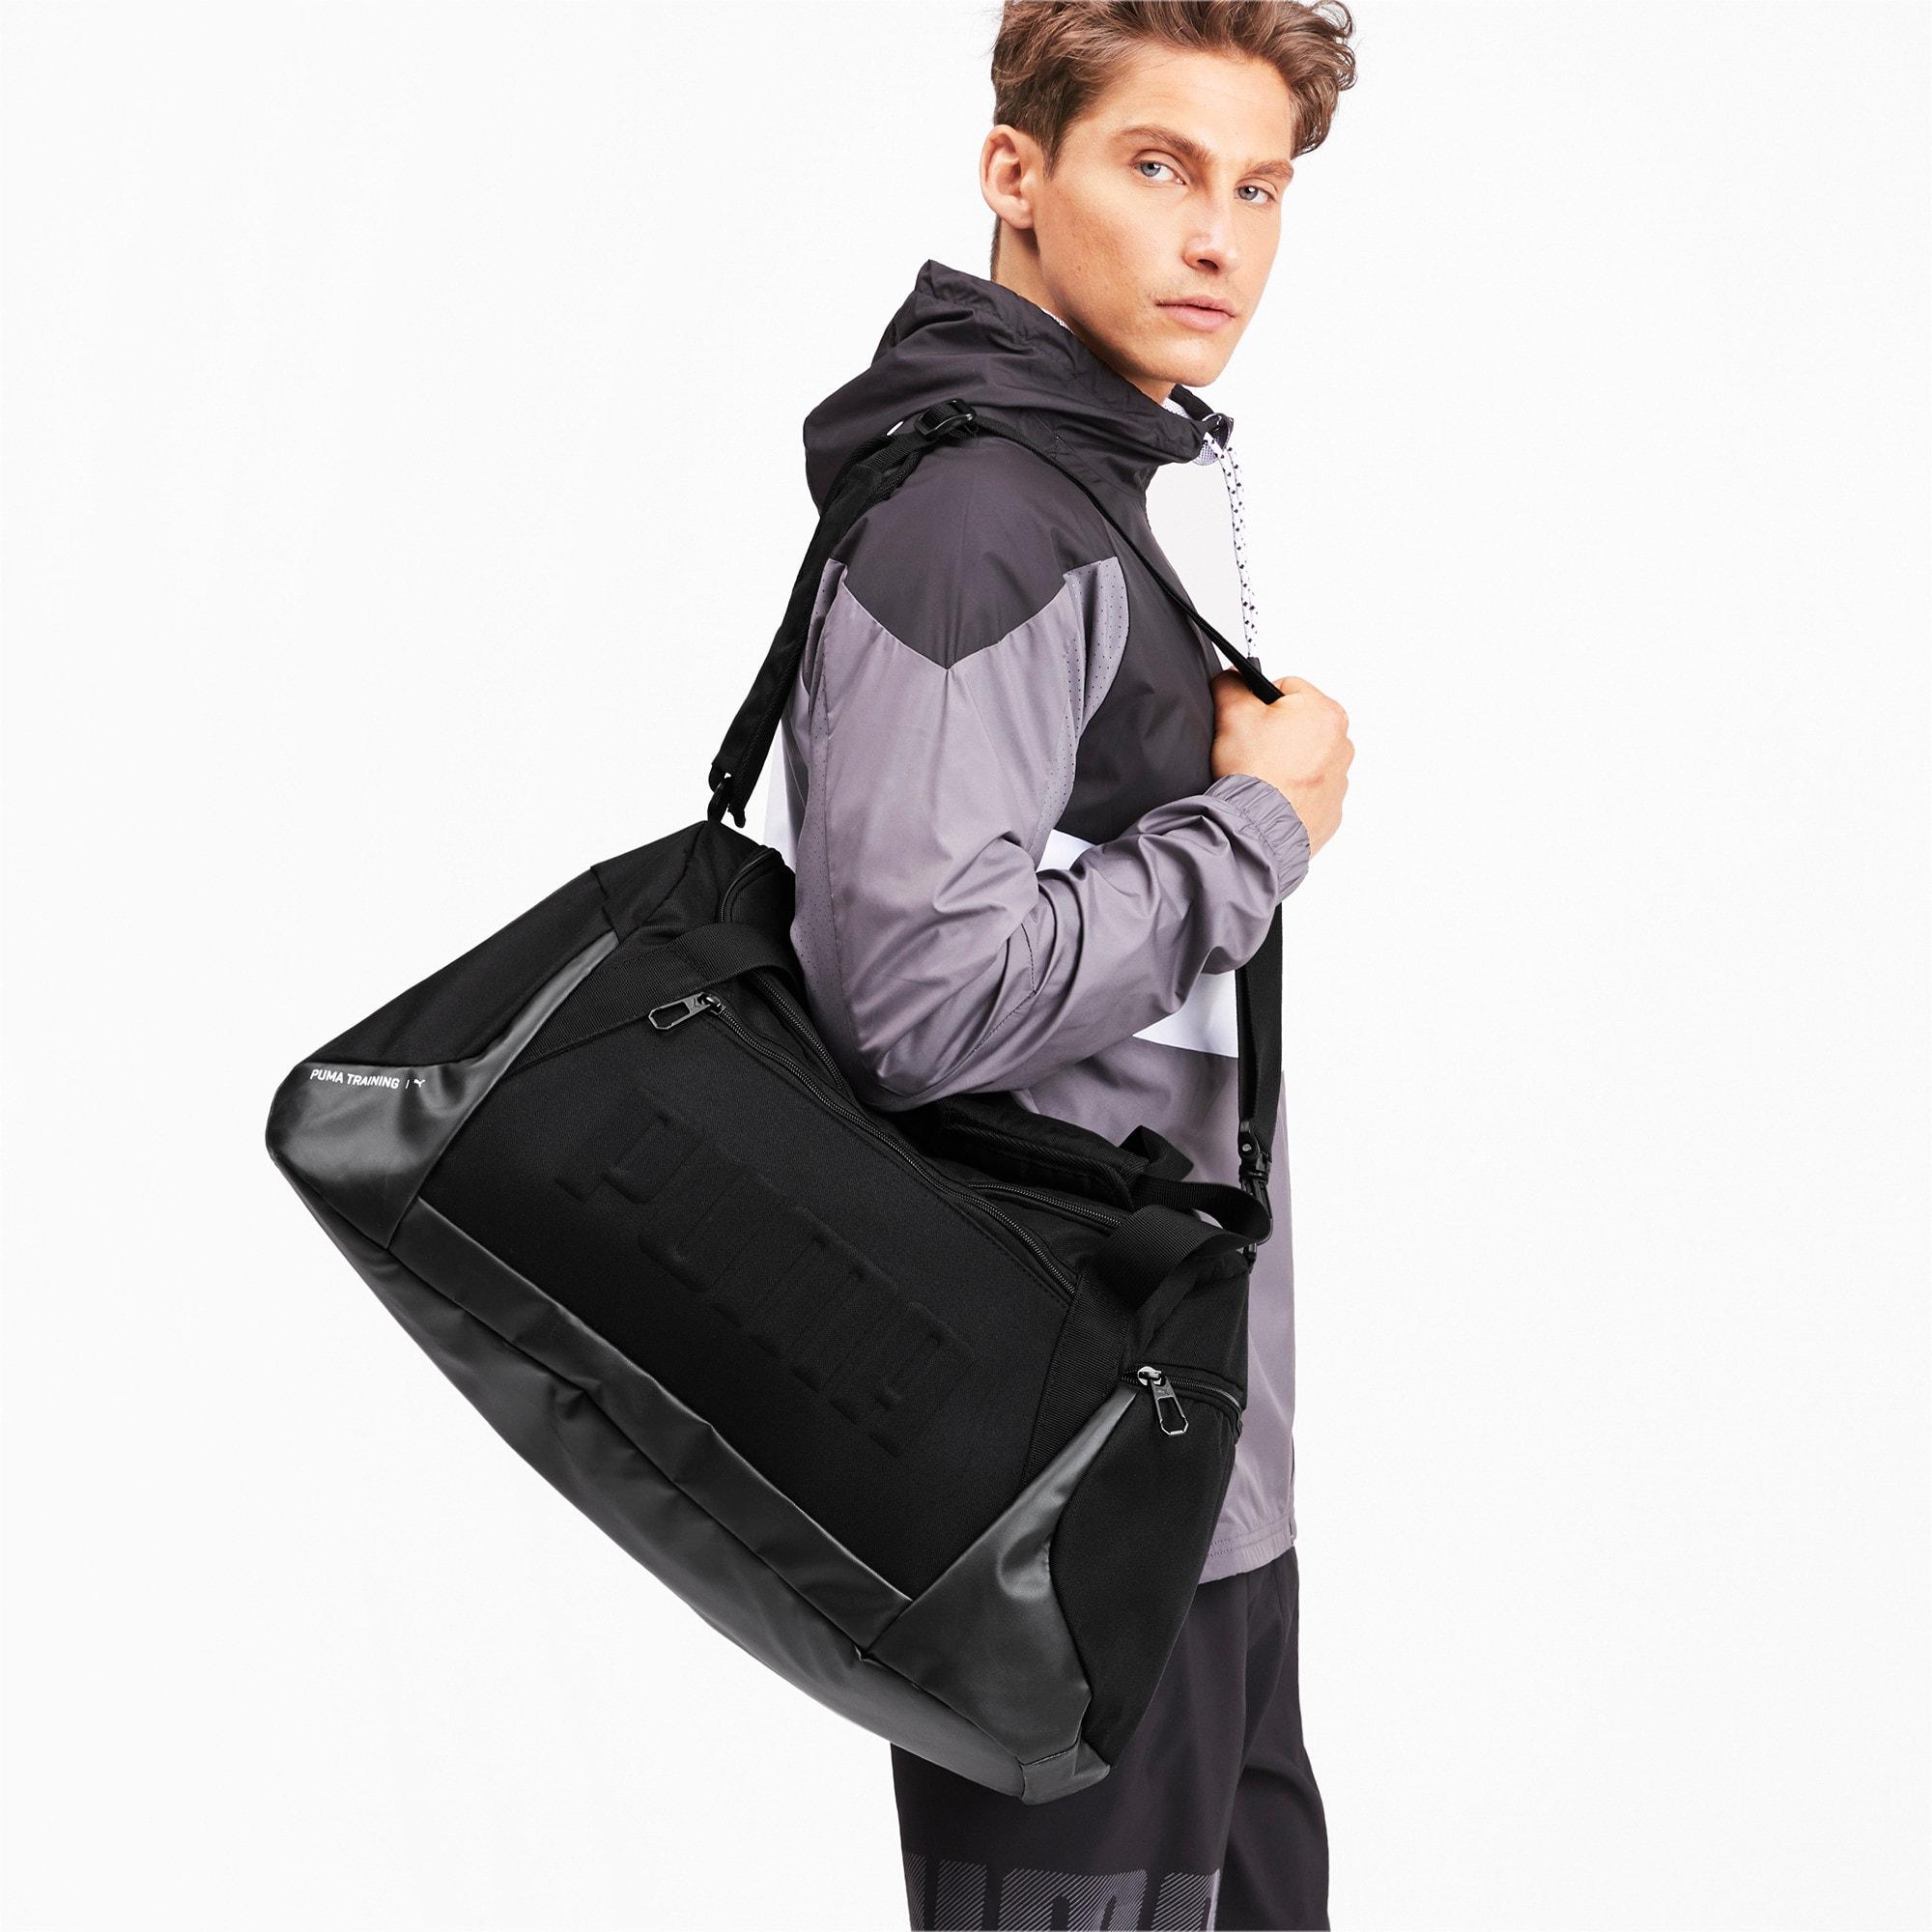 Thumbnail 2 of GYM Medium Duffle Bag, Puma Black, medium